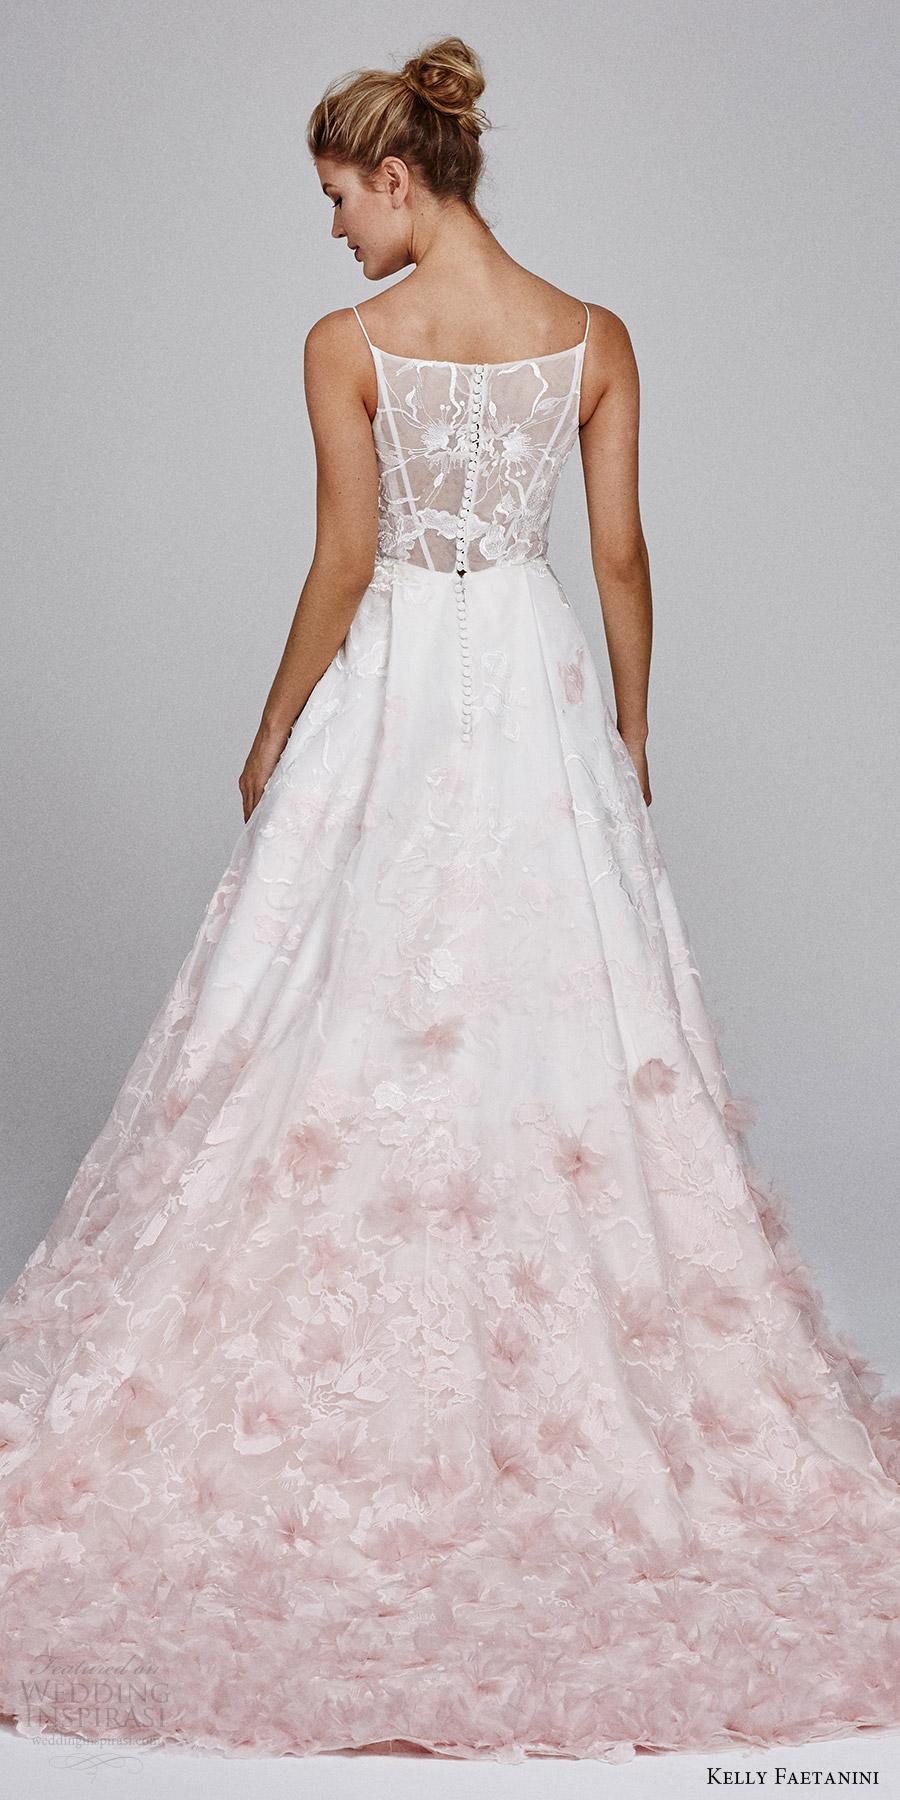 Kelly faetanini fall 2017 wedding dresses wedding inspirasi for Wedding guest dresses fall 2017